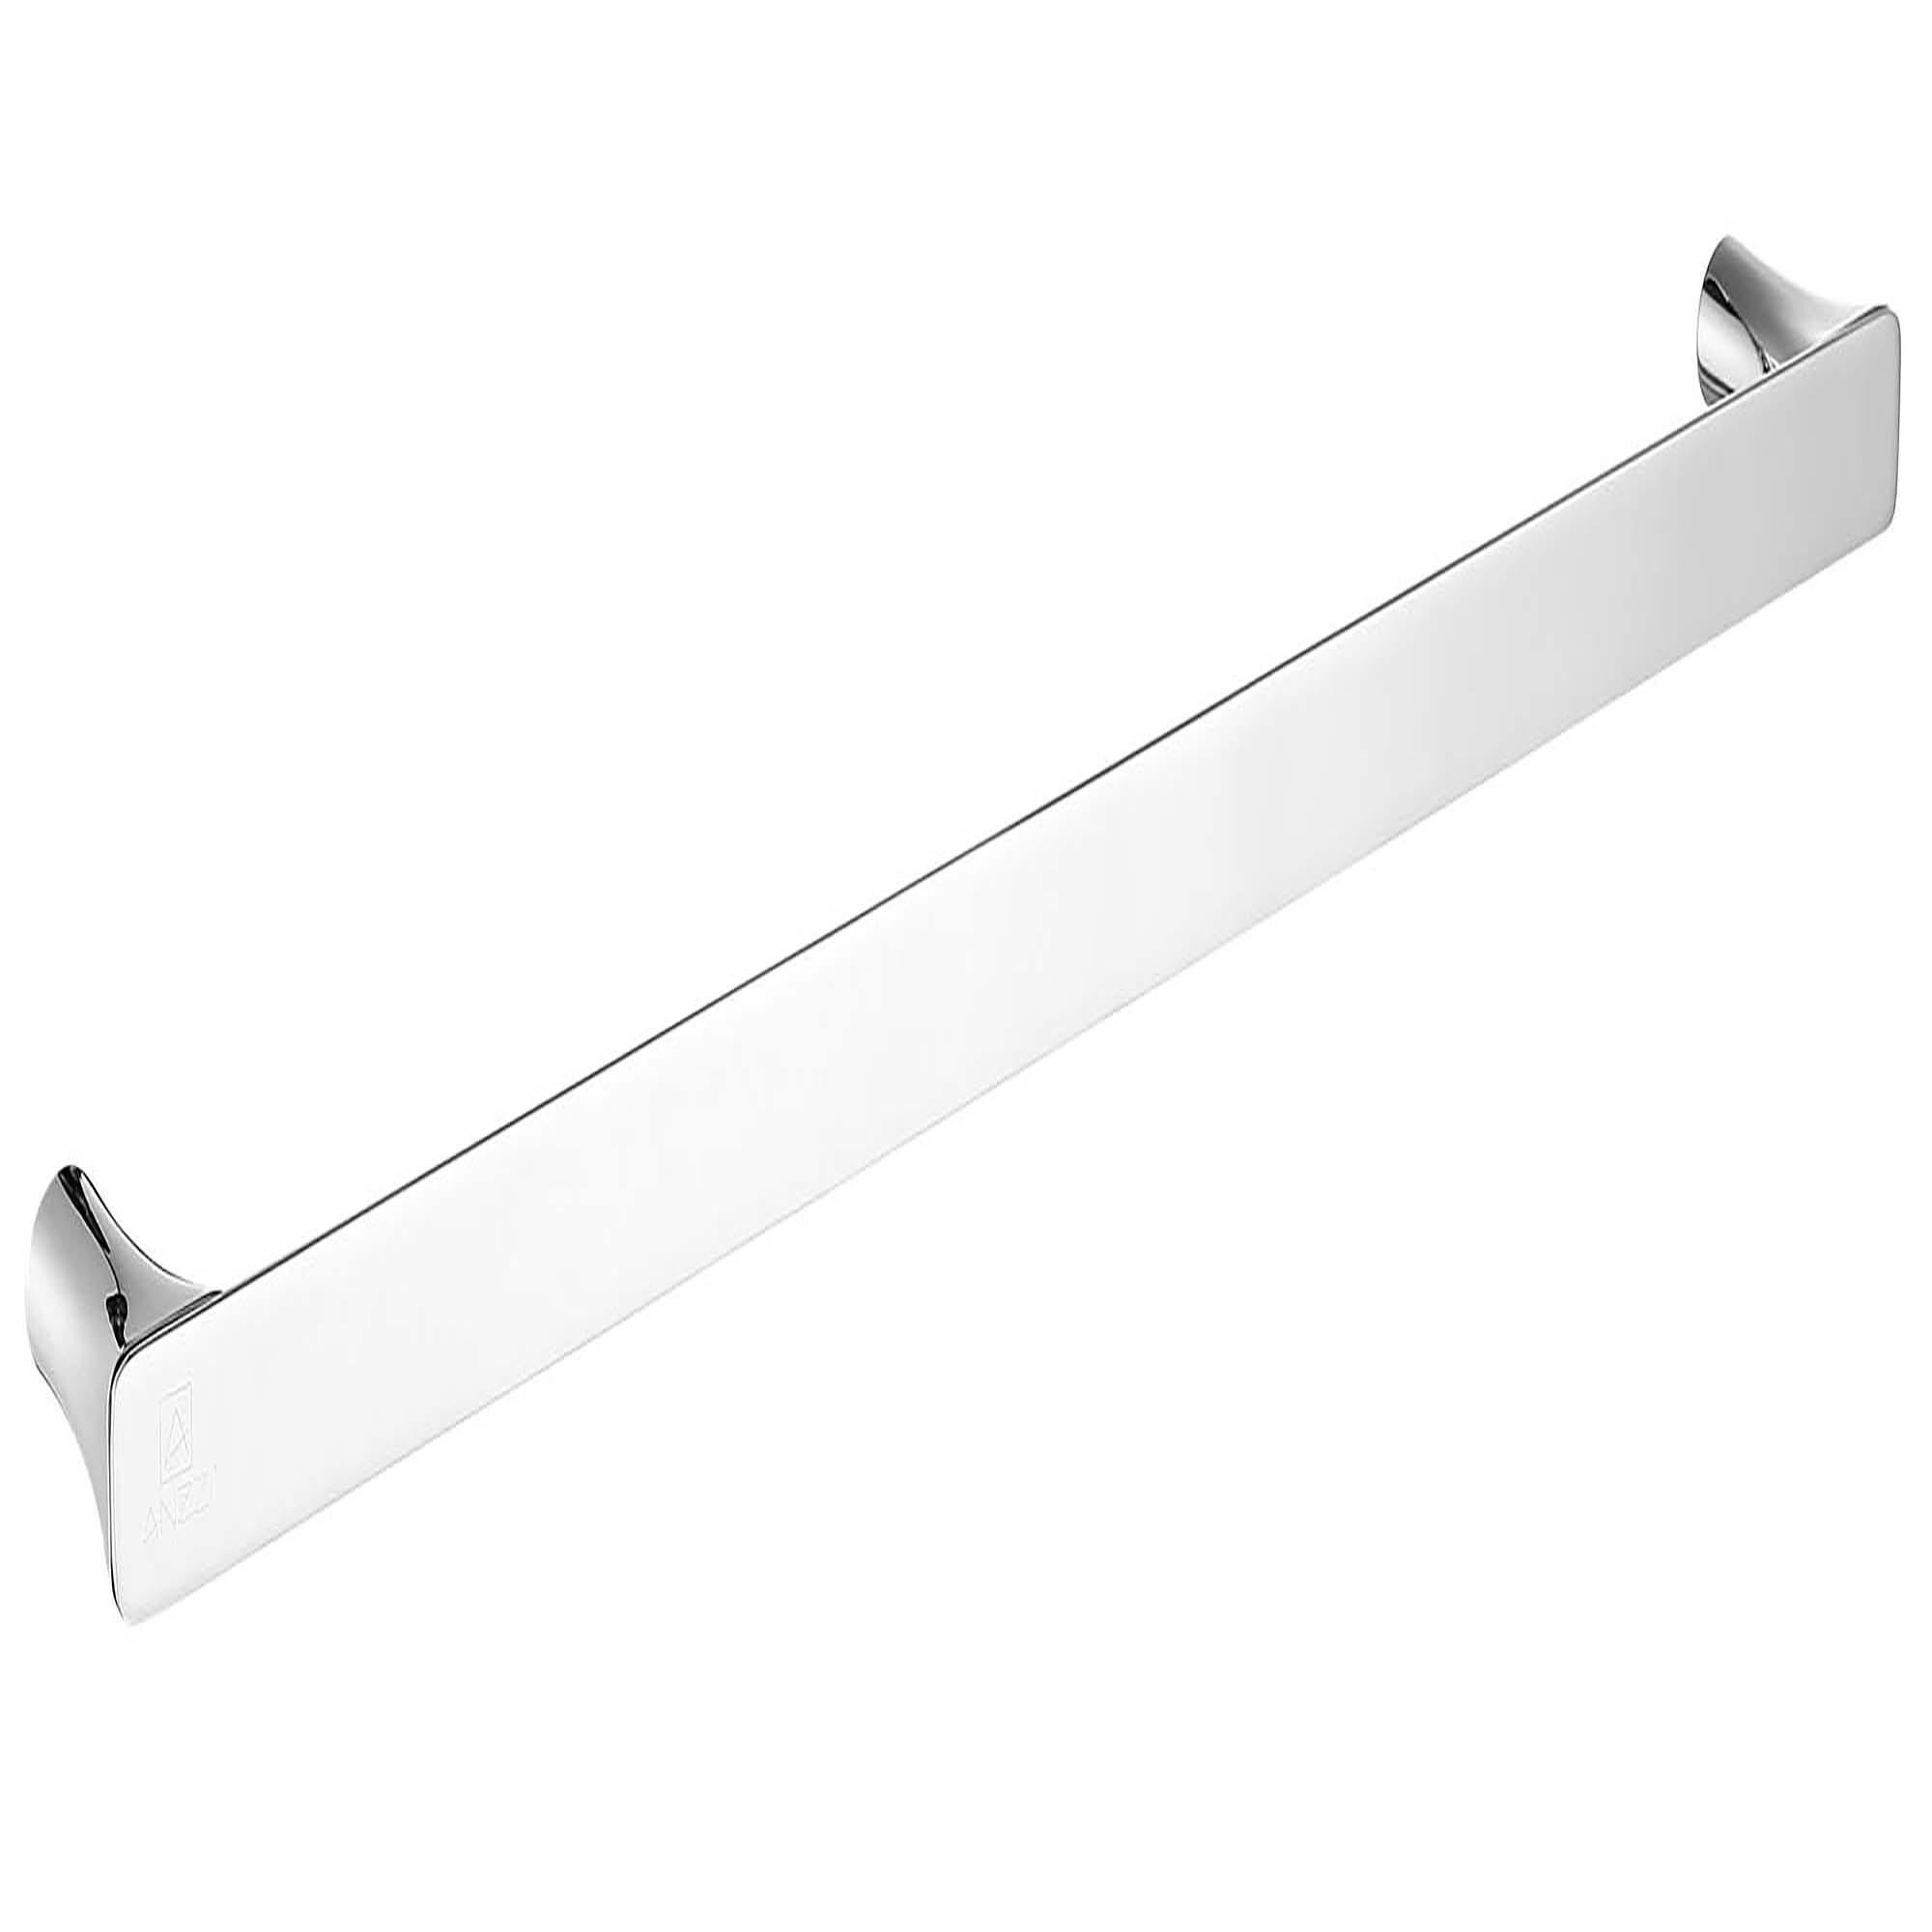 ANZZI AC-AZ052 Essence Series Square Single Towel Bar In Polished Chrome